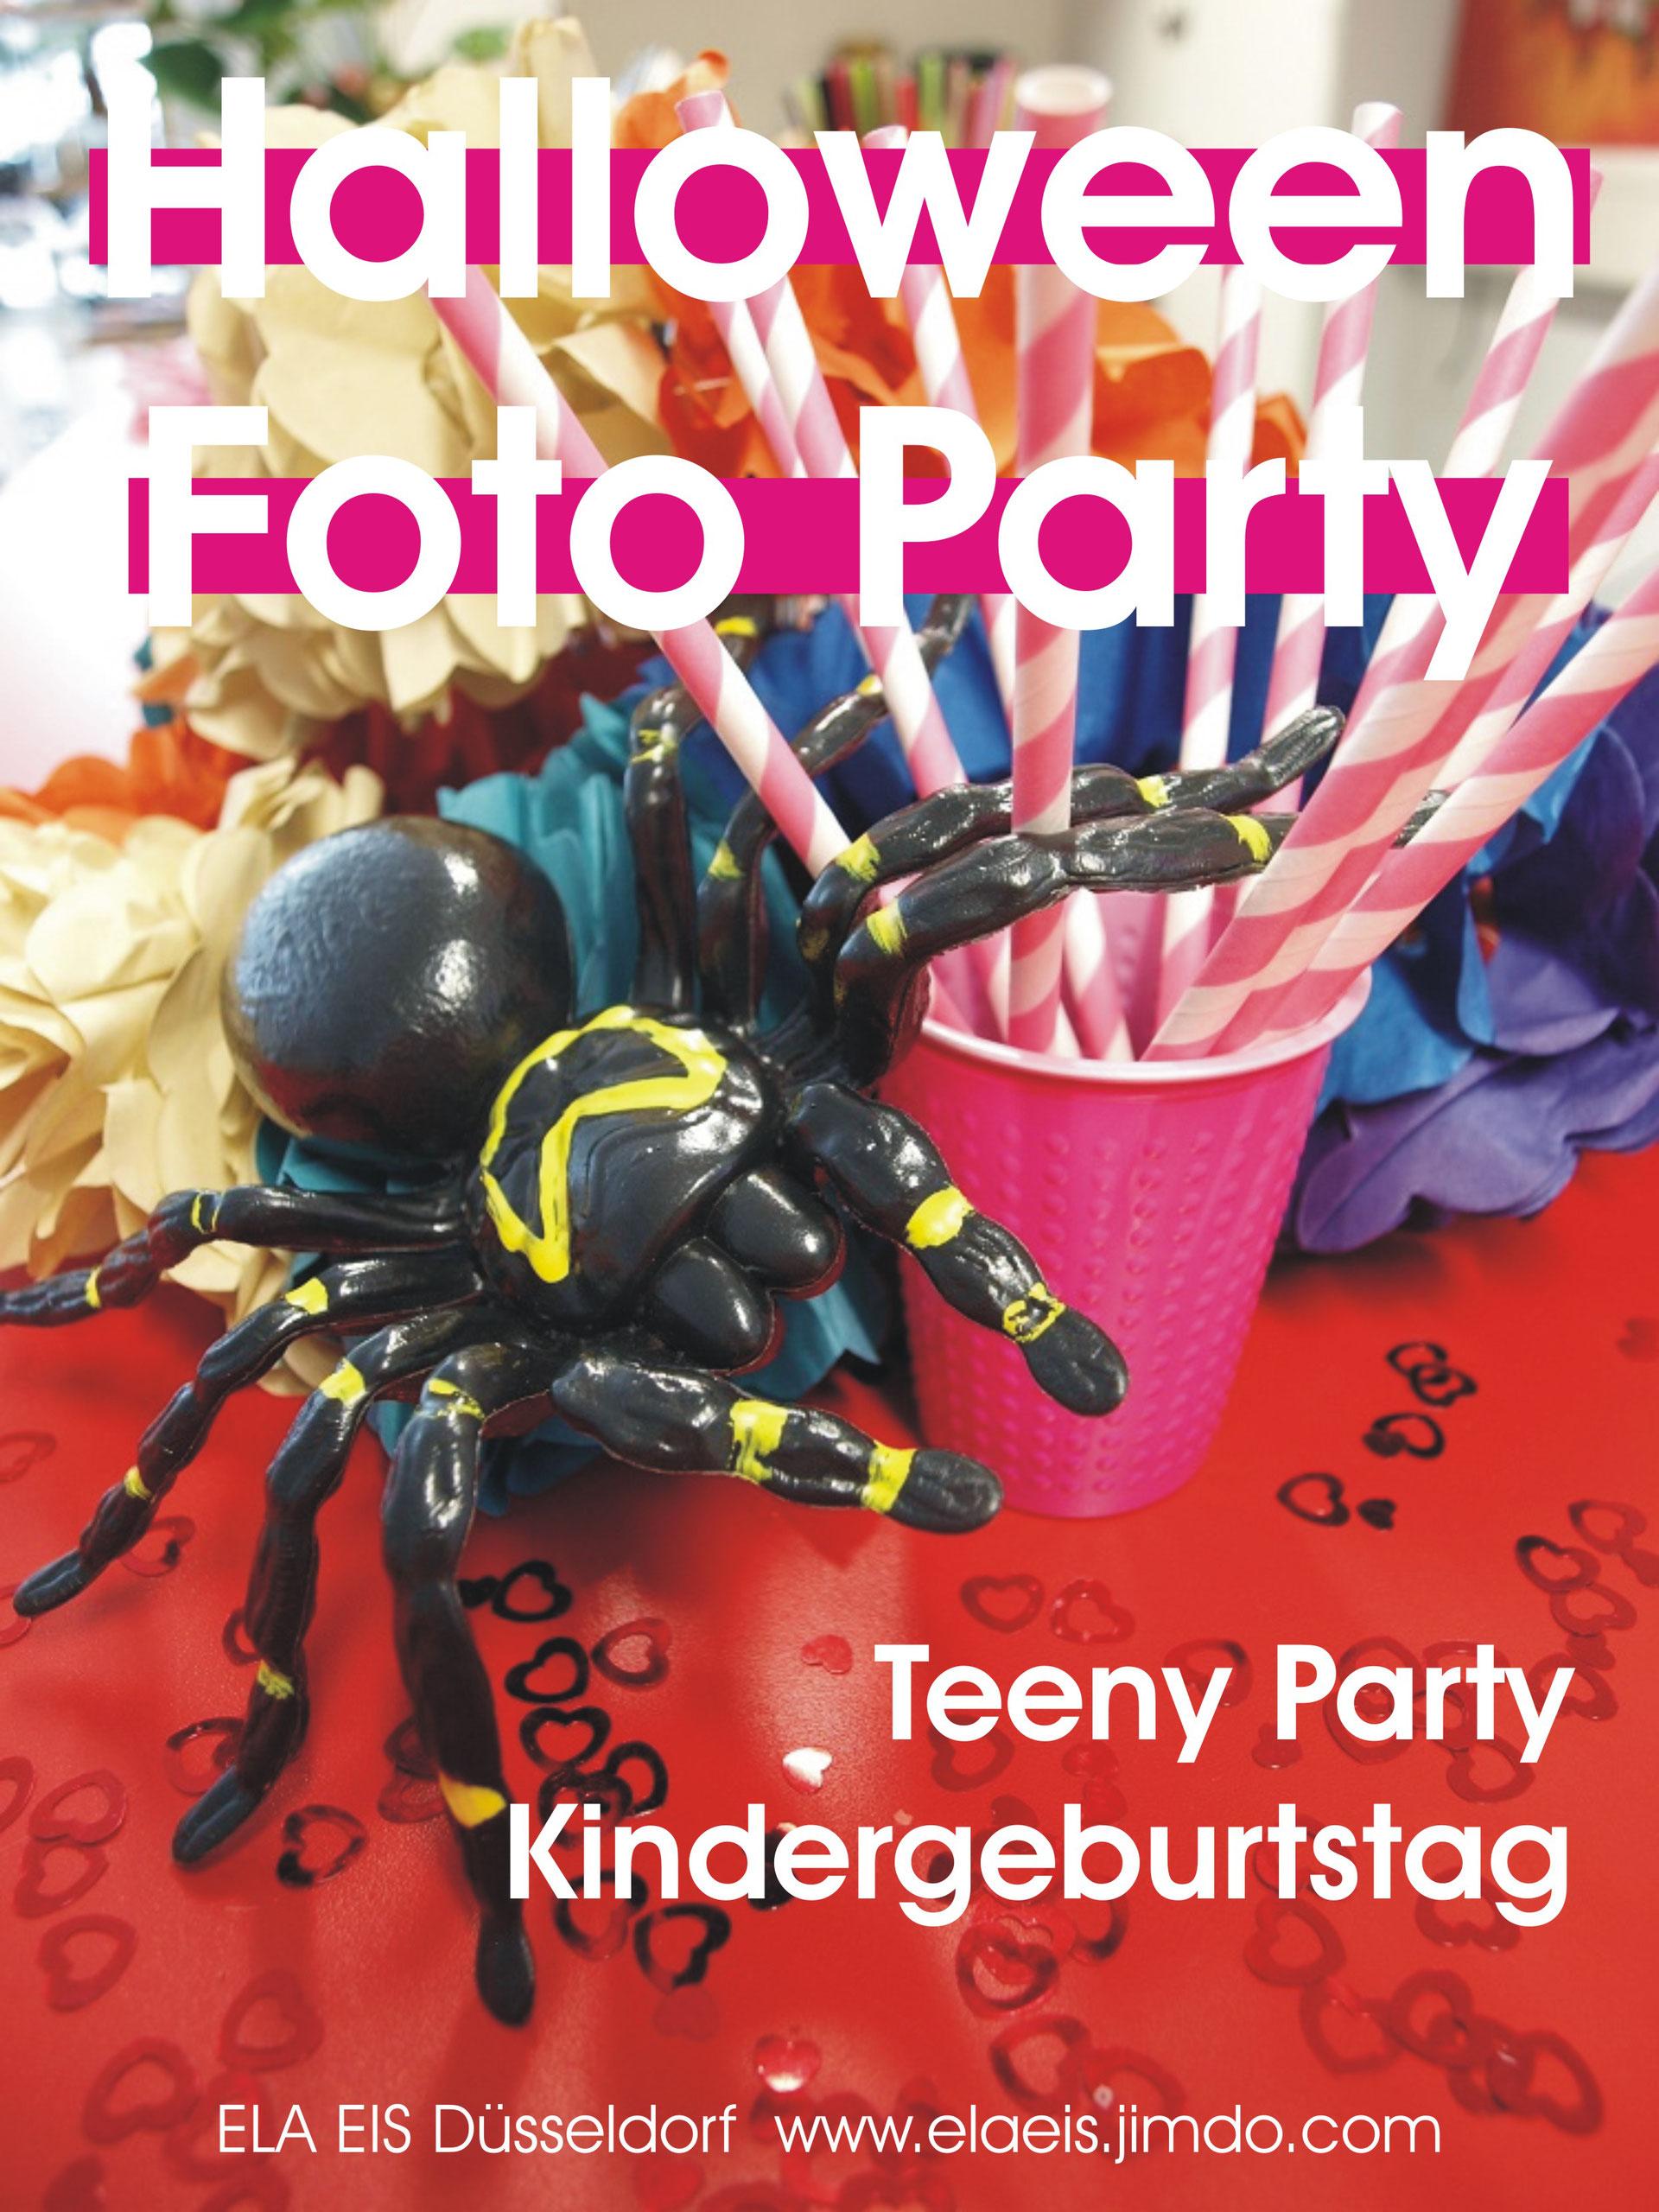 Halloween Kindergeburtstag.Kindergeburtstag Dusseldorf Halloween Geisterparty